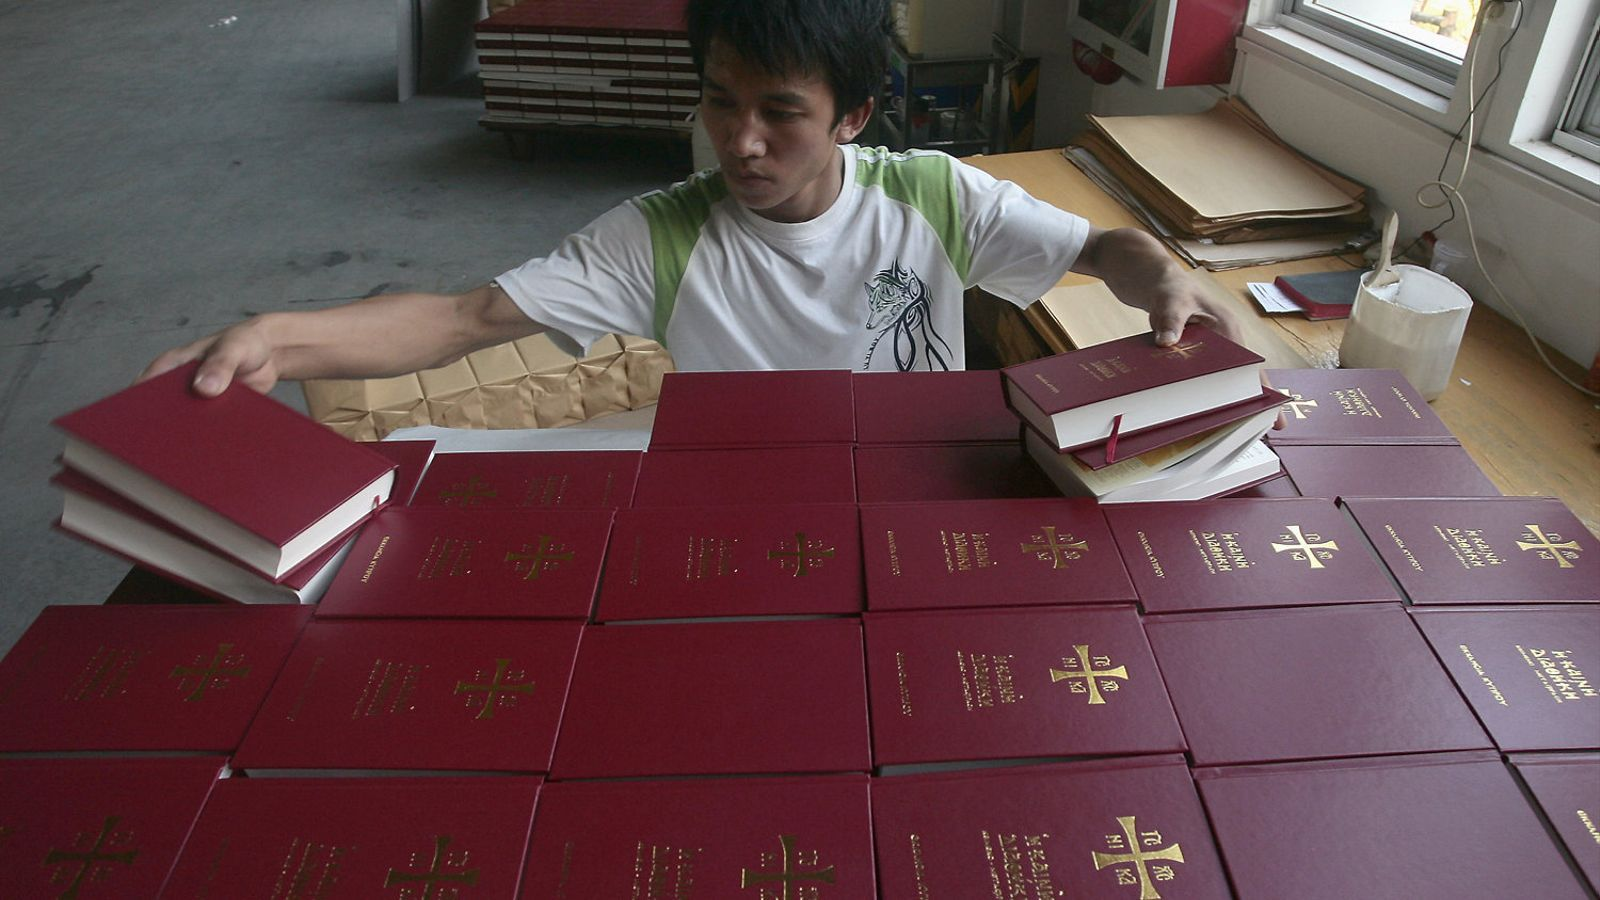 Un treballador revisant bíblies en una impremta de Pequín.